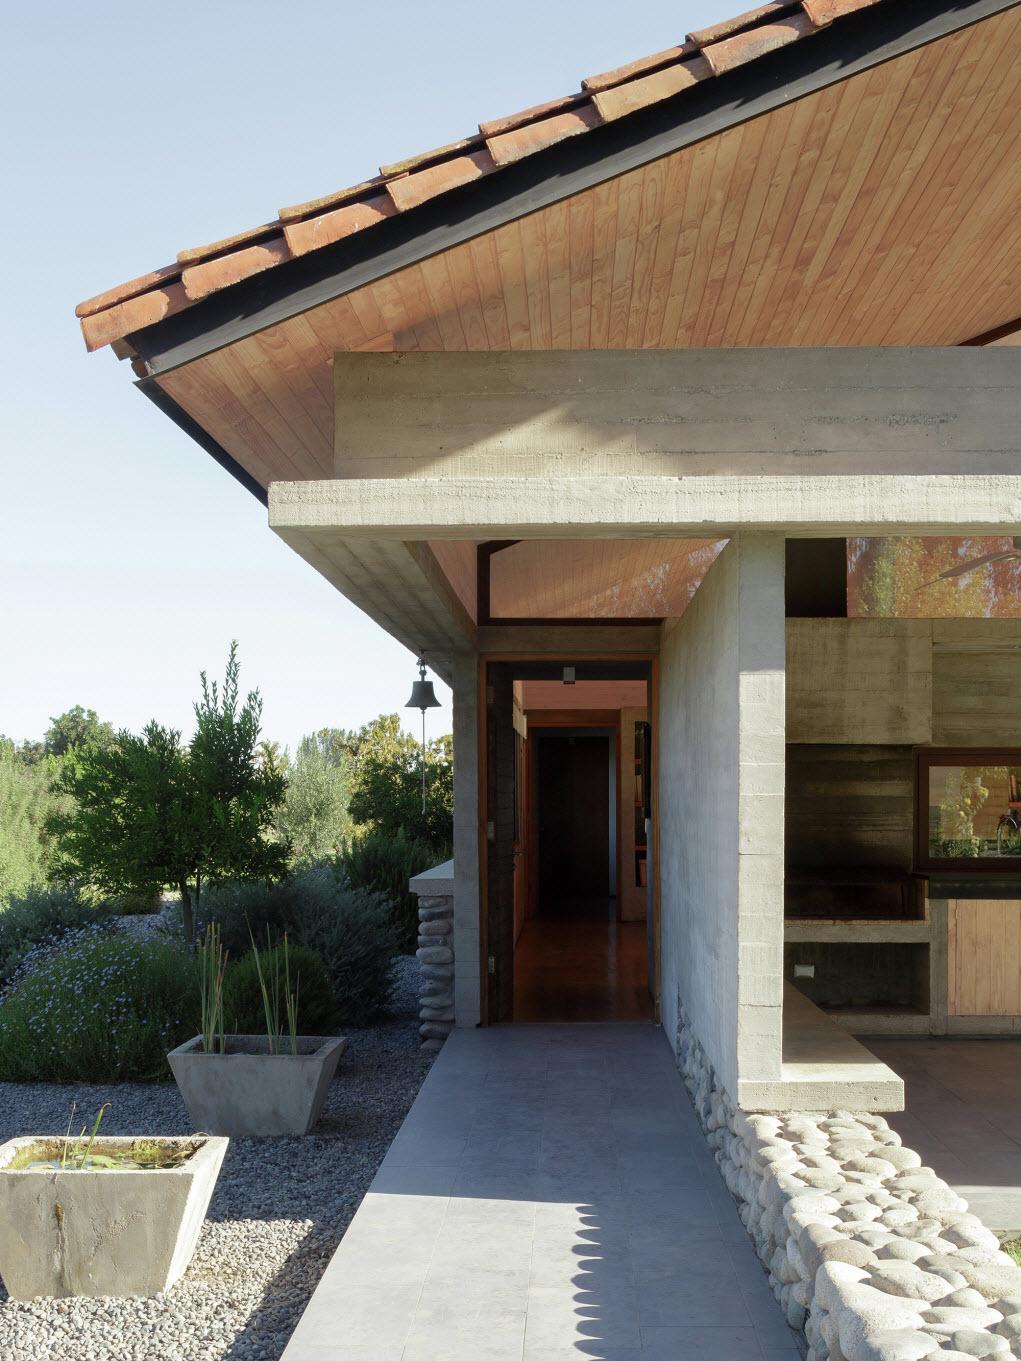 Dise o de casa de campo de un piso construye hogar for Casa y diseno montevideo